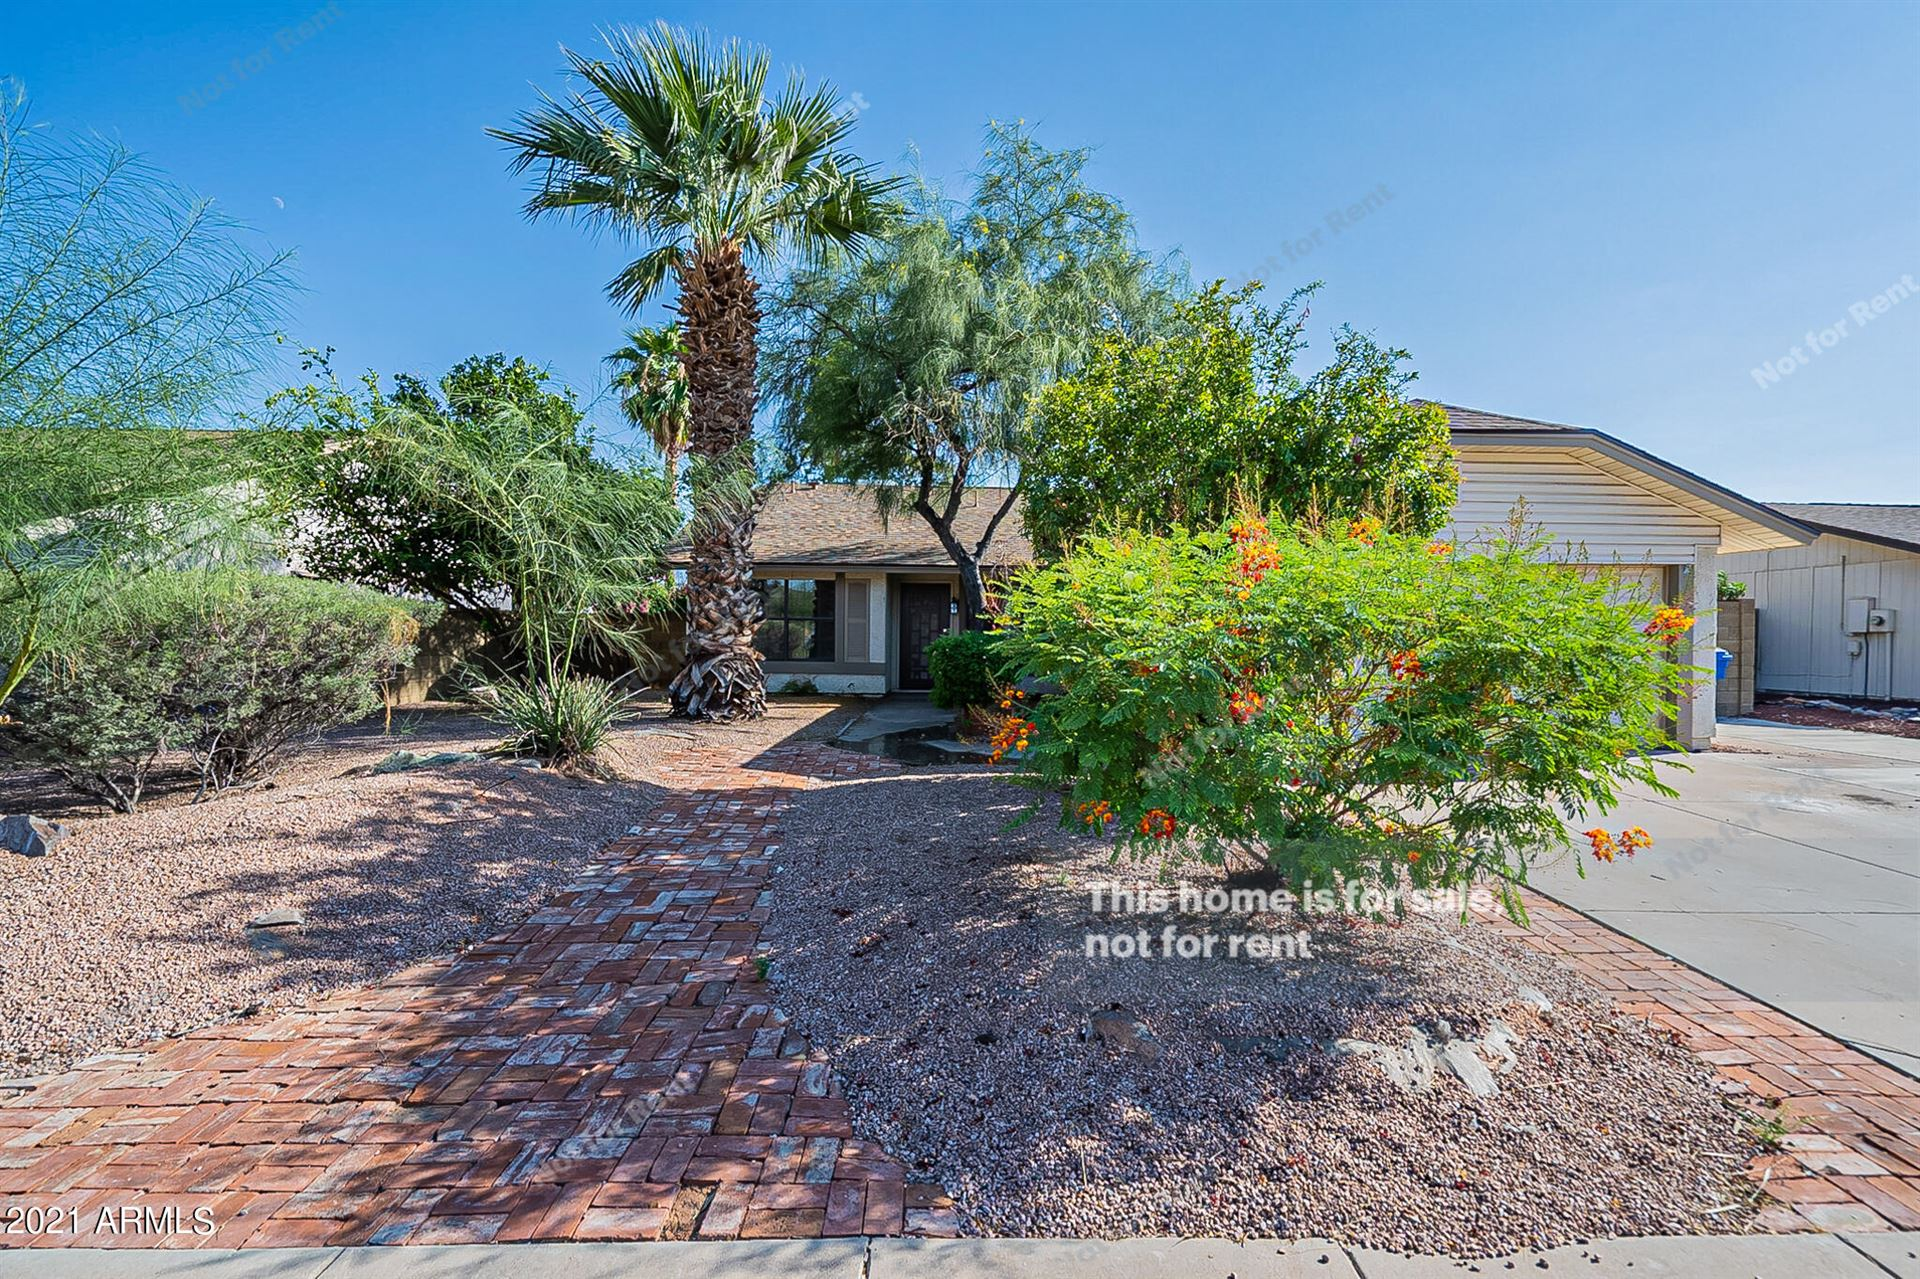 Photo of 5045 E NAMBE Street, Phoenix, AZ 85044 (MLS # 6296703)